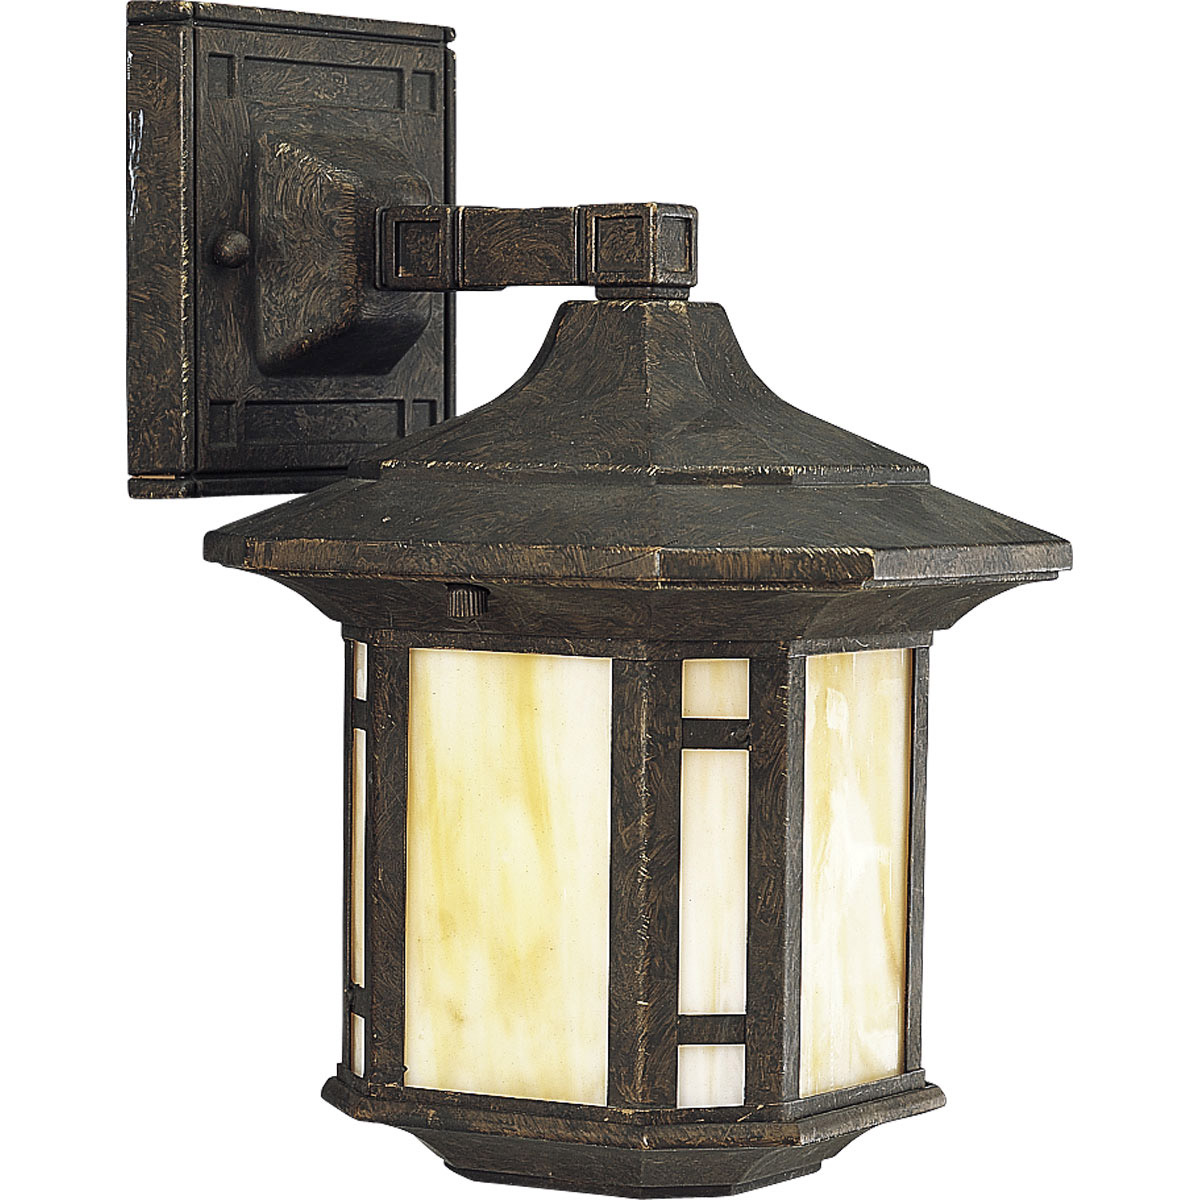 Outdoor Lighting Fixtures Arts And Crafts Progress Lighting P5628 46 Arts And Crafts Outdoor Wall Mount Lantern